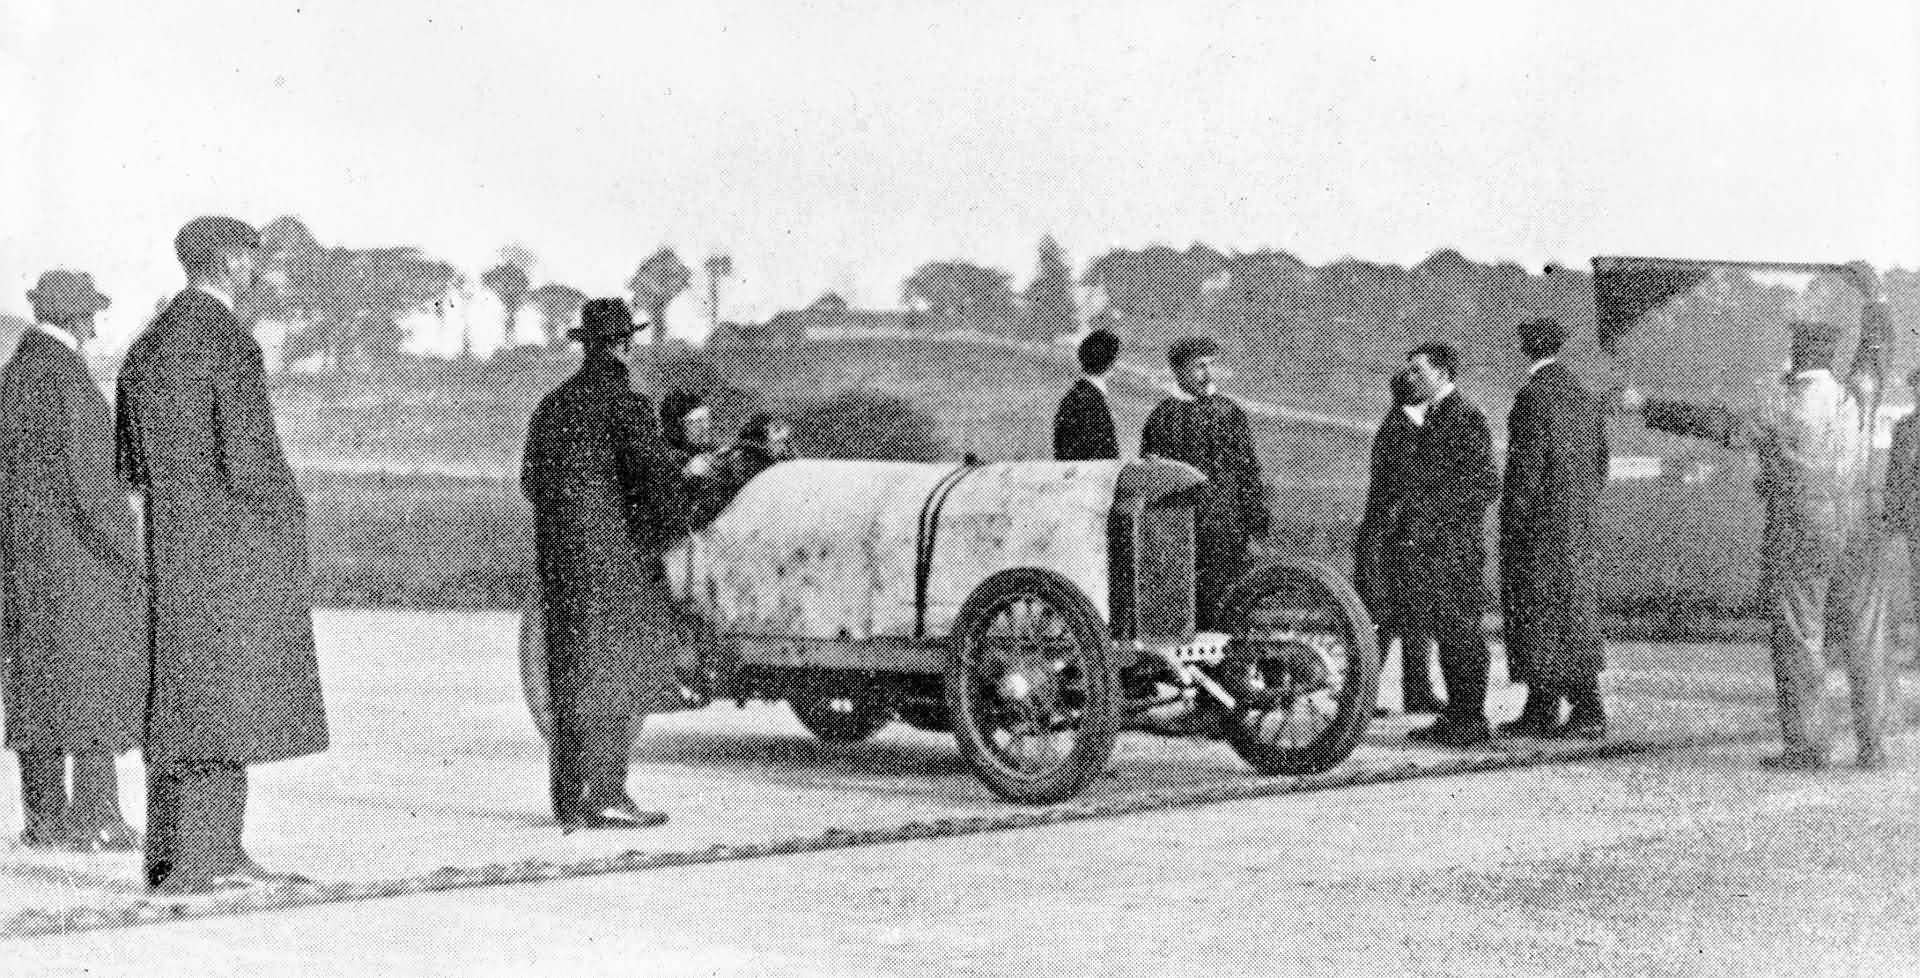 Blitzen-Benz Rekordfahrt in Brooklands/England